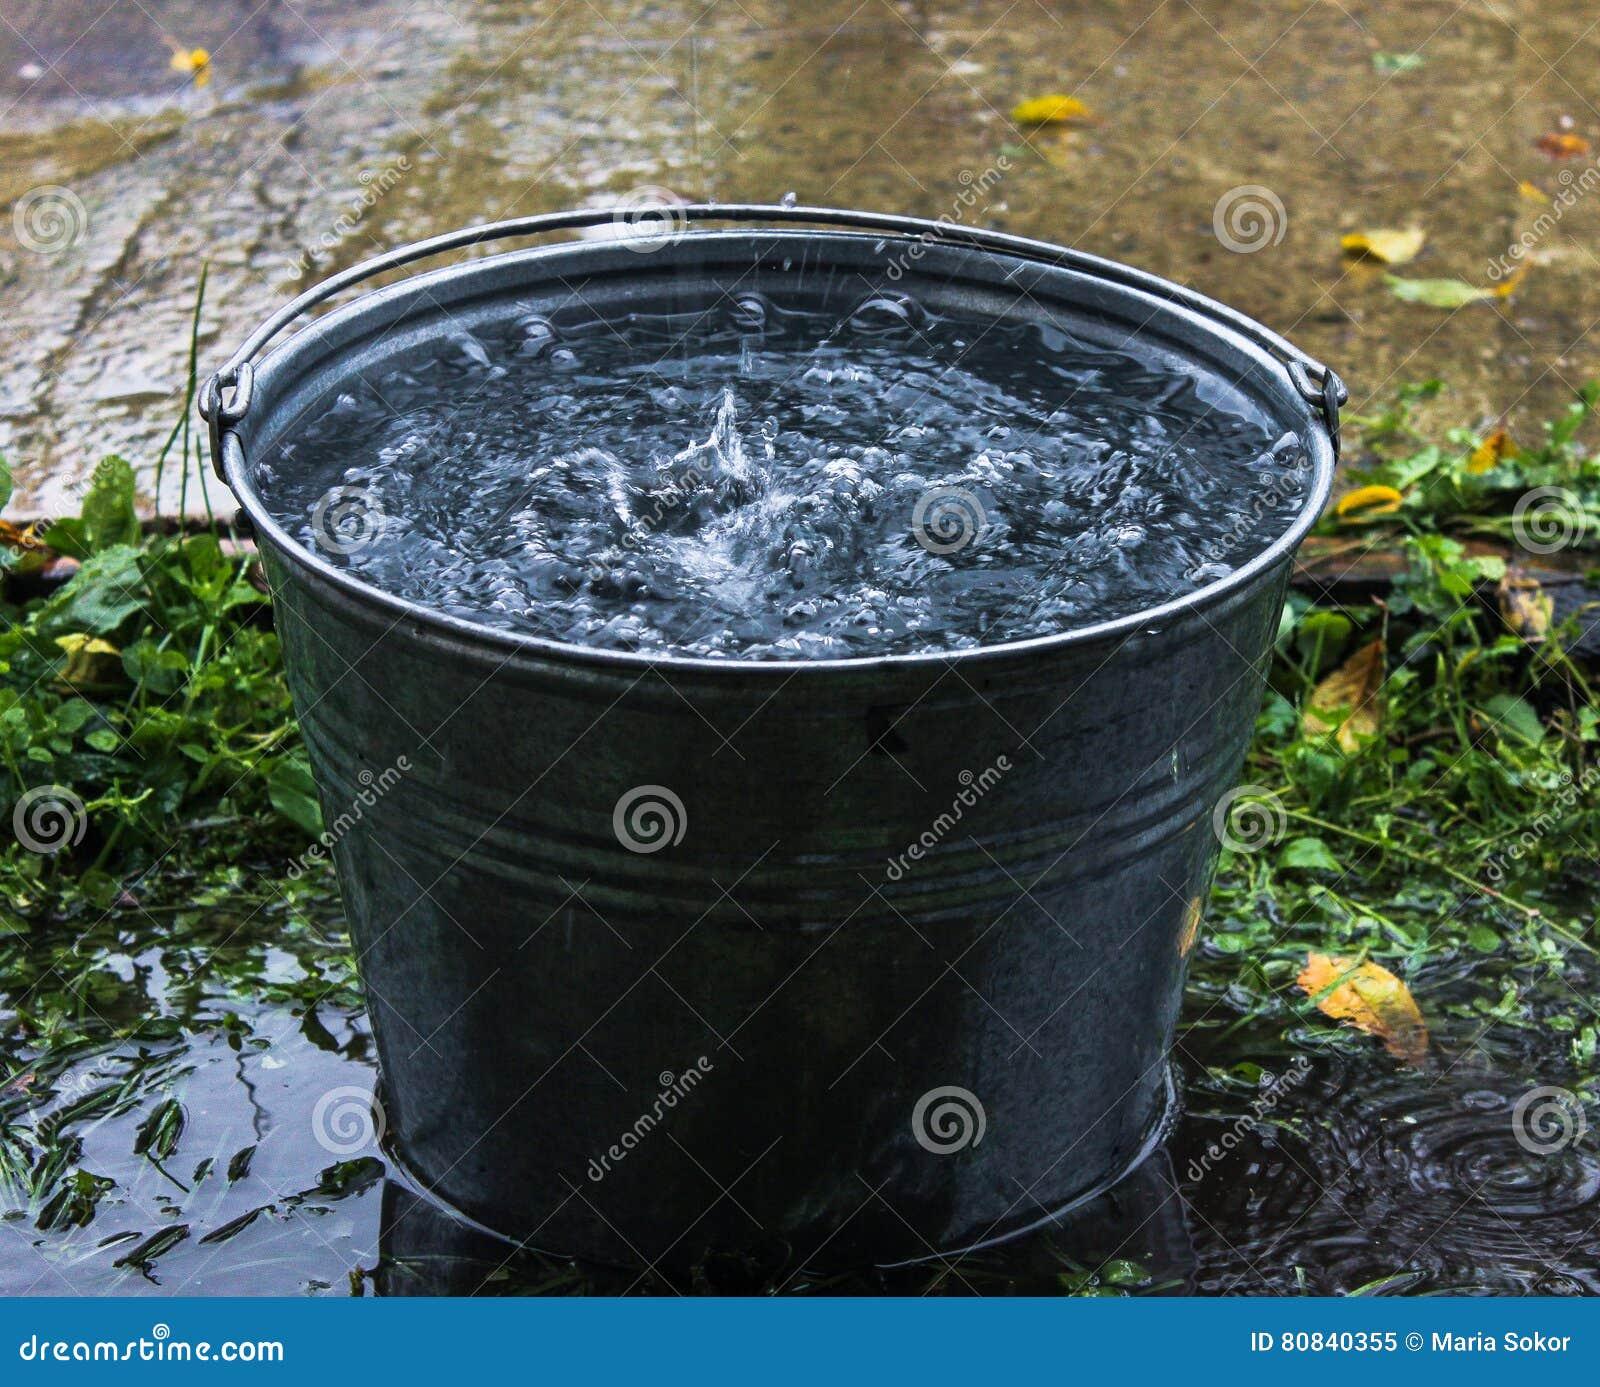 Full Bucket Of Water Rain Stock Image Image Of Drop